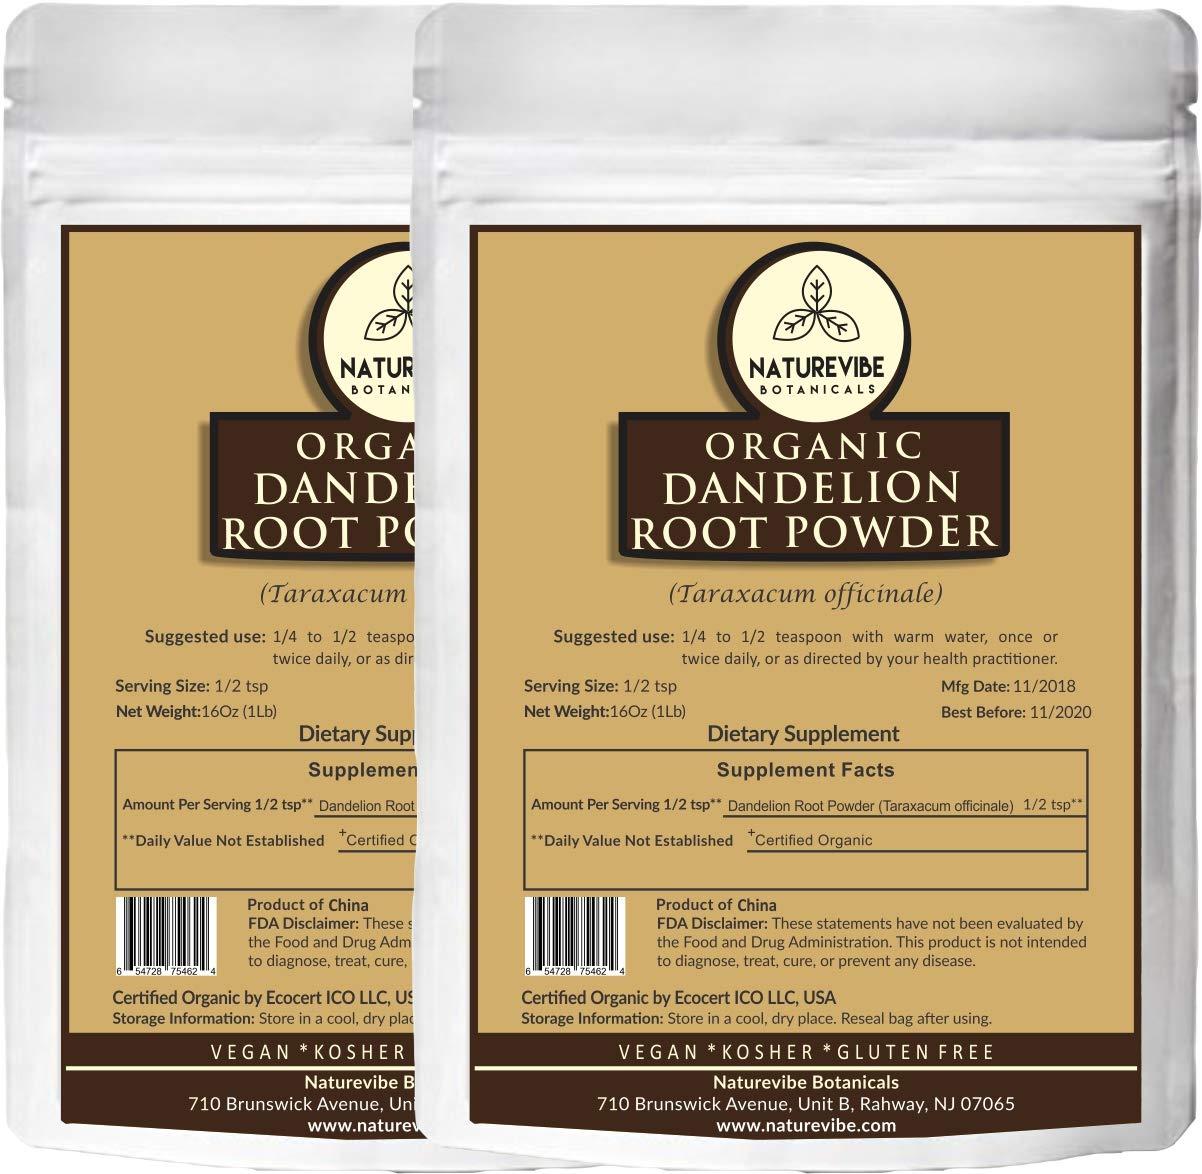 Naturevibe Botanicals Organic Dandelion Root Powder 2lbs (2 pack of 1lb each), Taraxacum officinale   Non-GMO & Gluten Free   Skincare